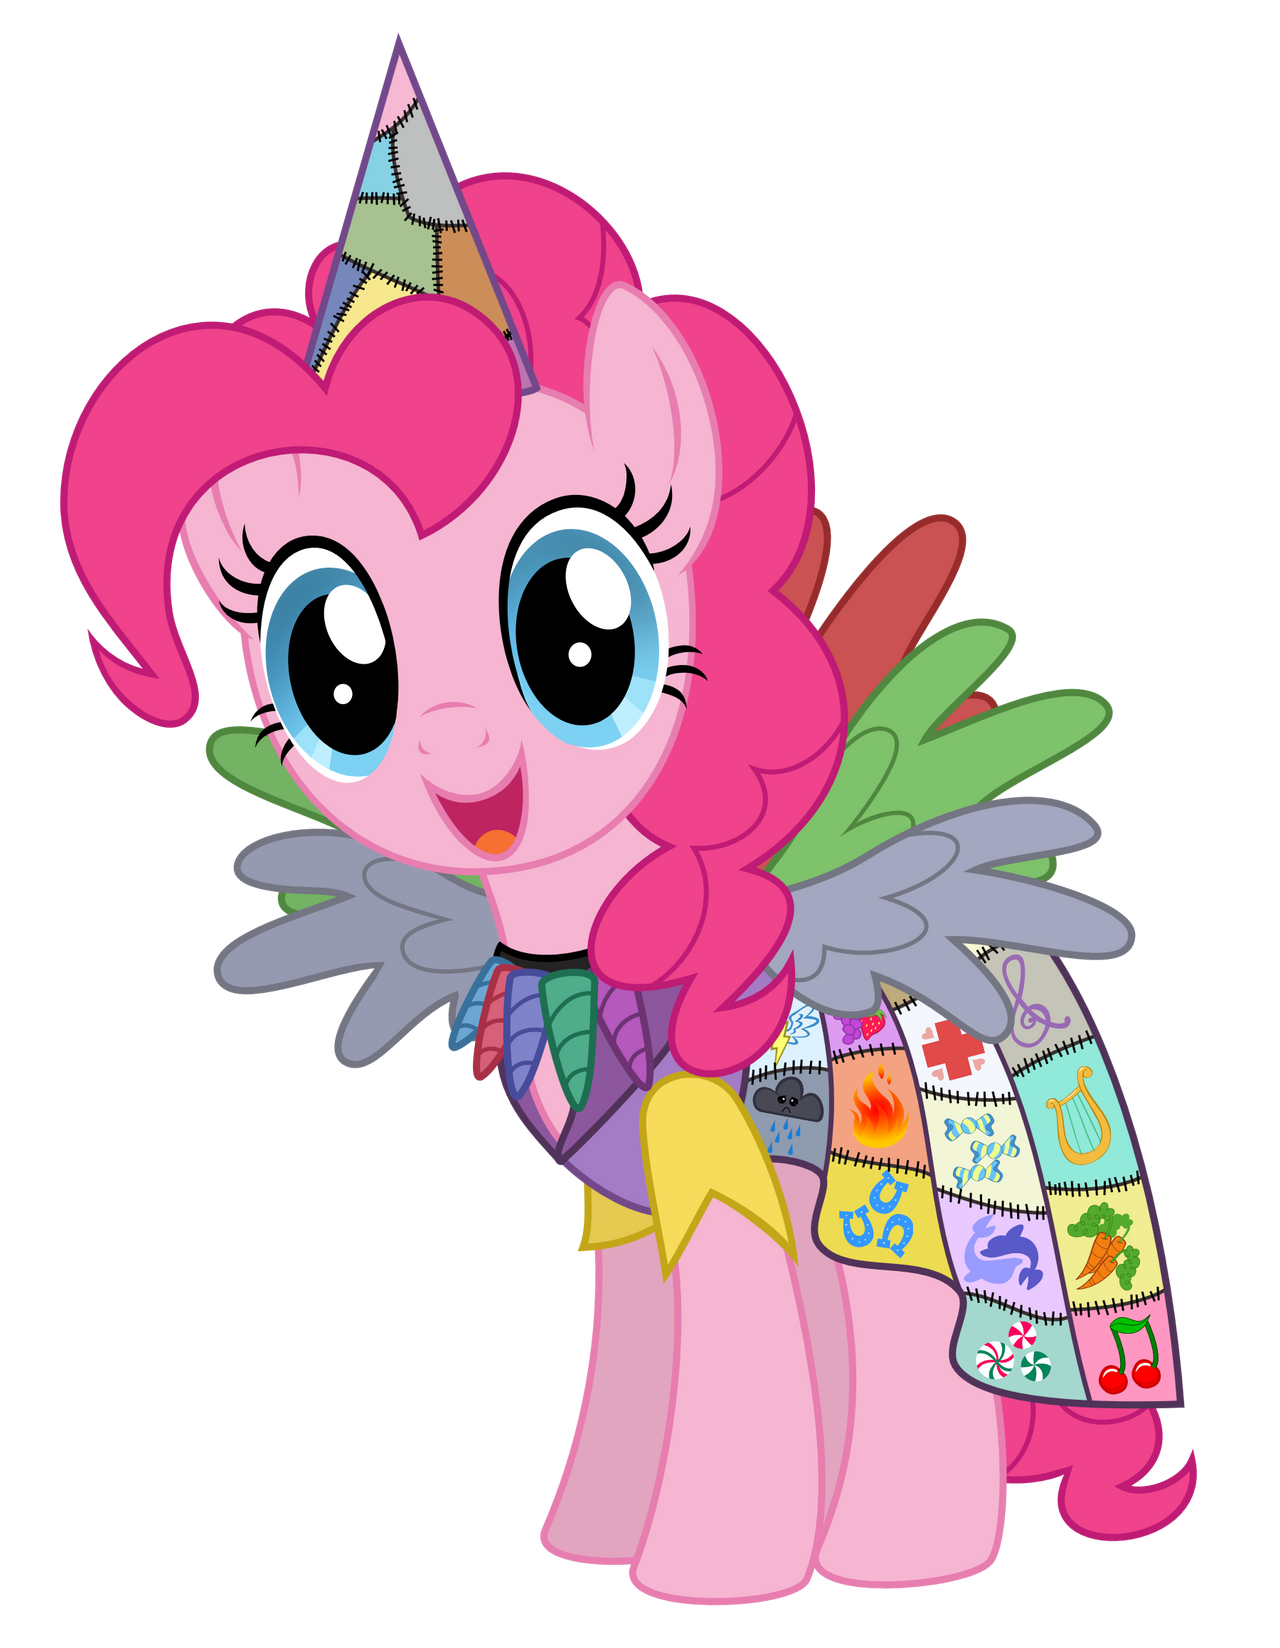 Let's Party, Pinkie Pie! by Reitanna-Seishin